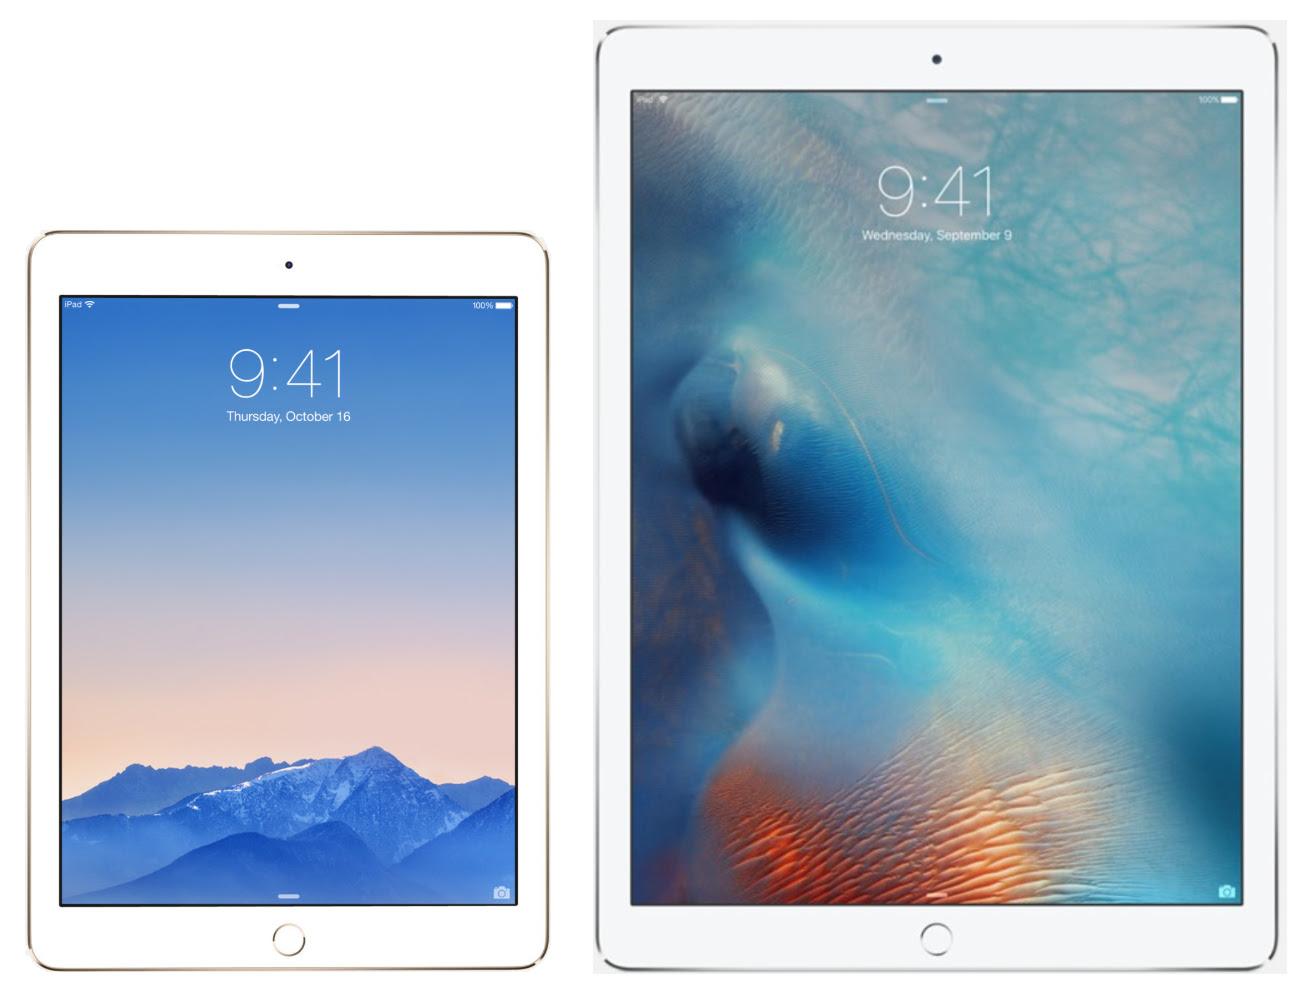 Apple iPad Air 2 and iPad Pro